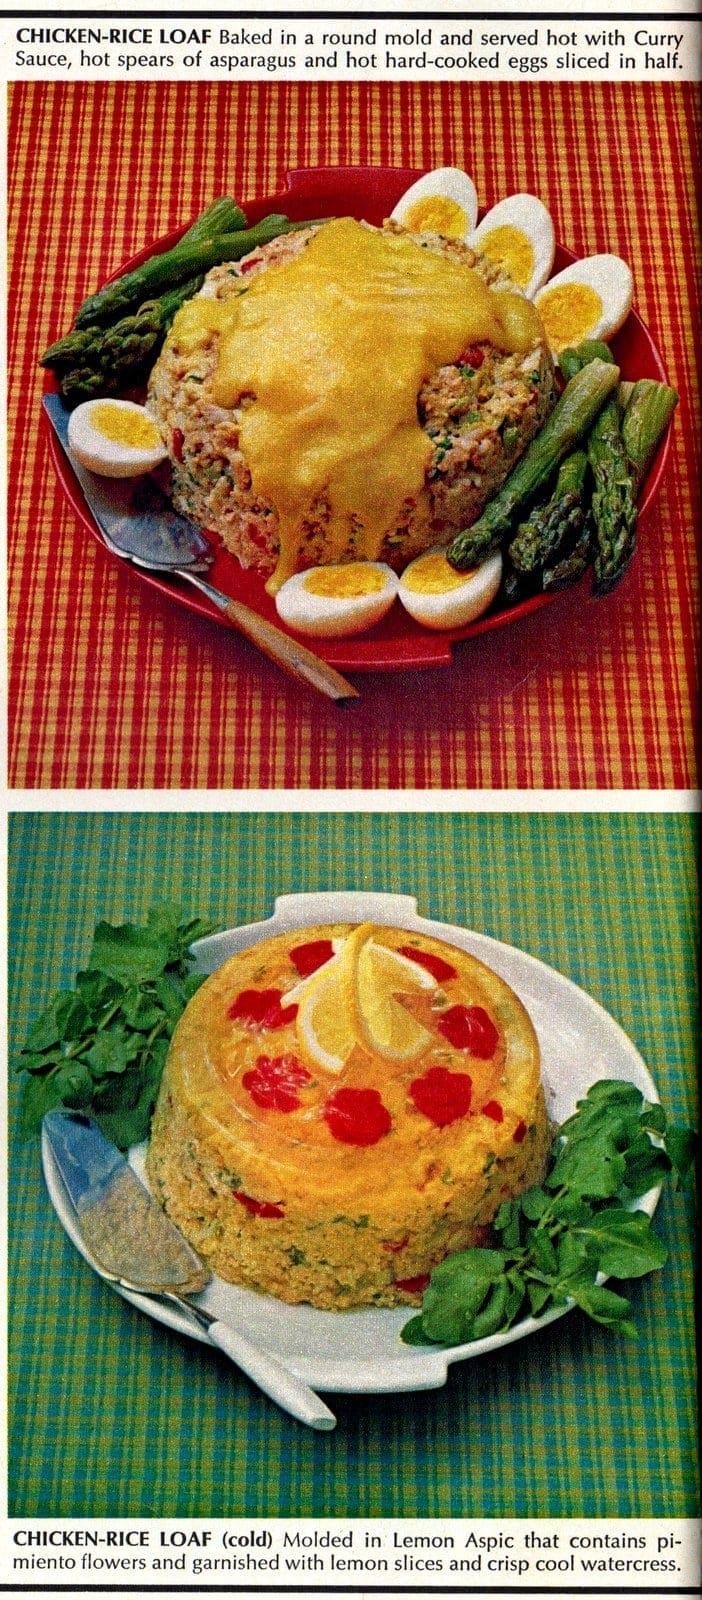 Chicken-rice meatloaf